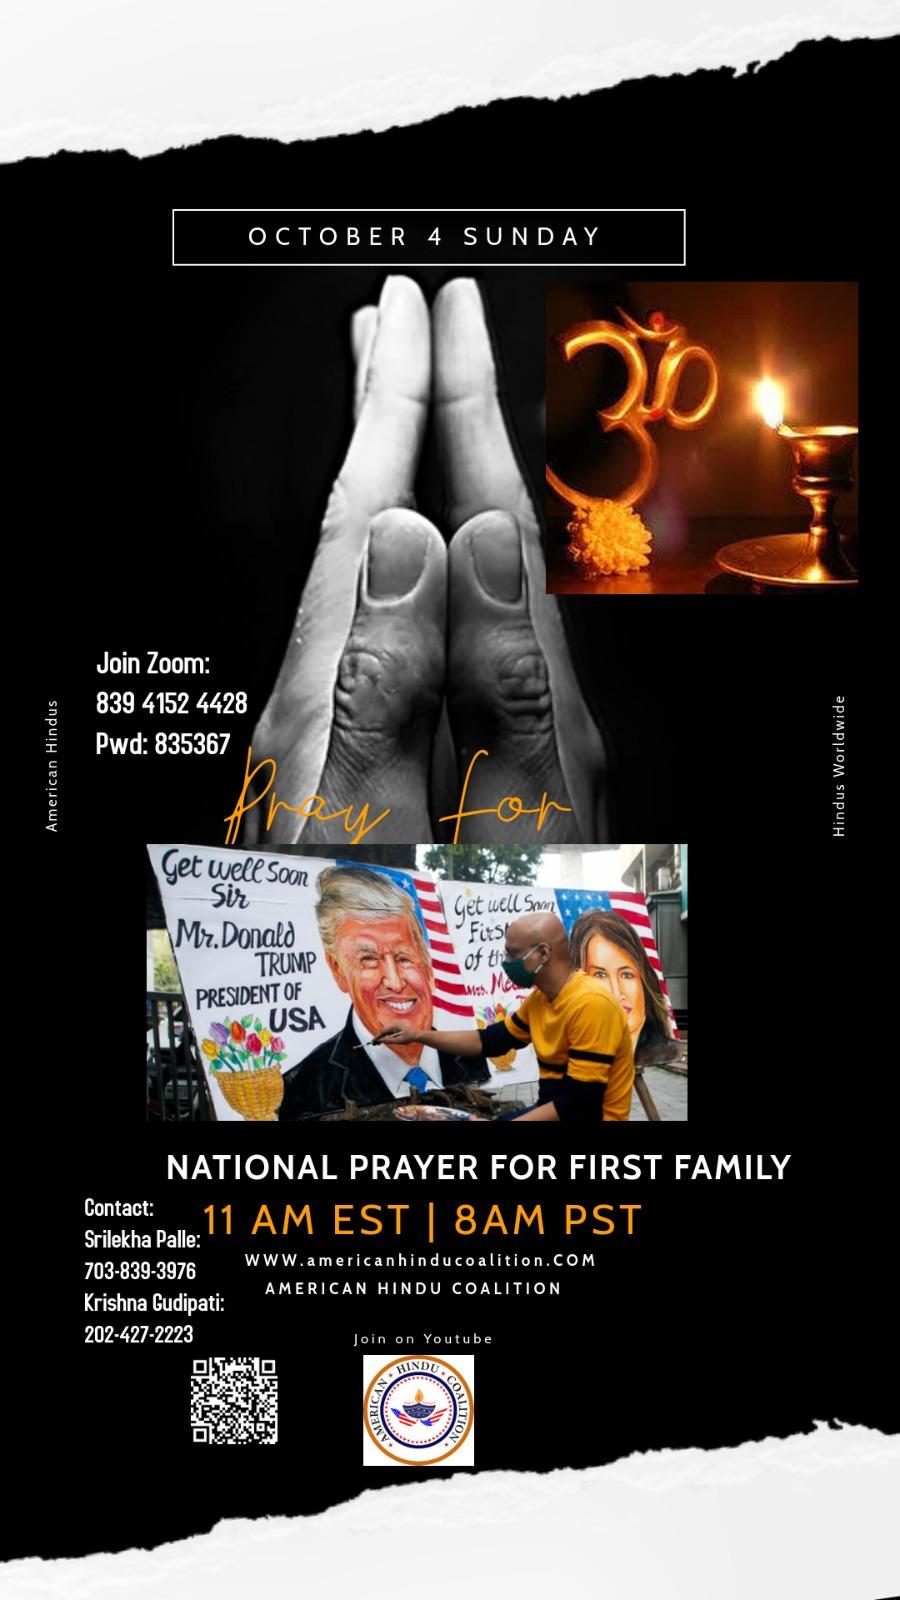 NATIONAL PRAYER FOR FIRST FAMILY